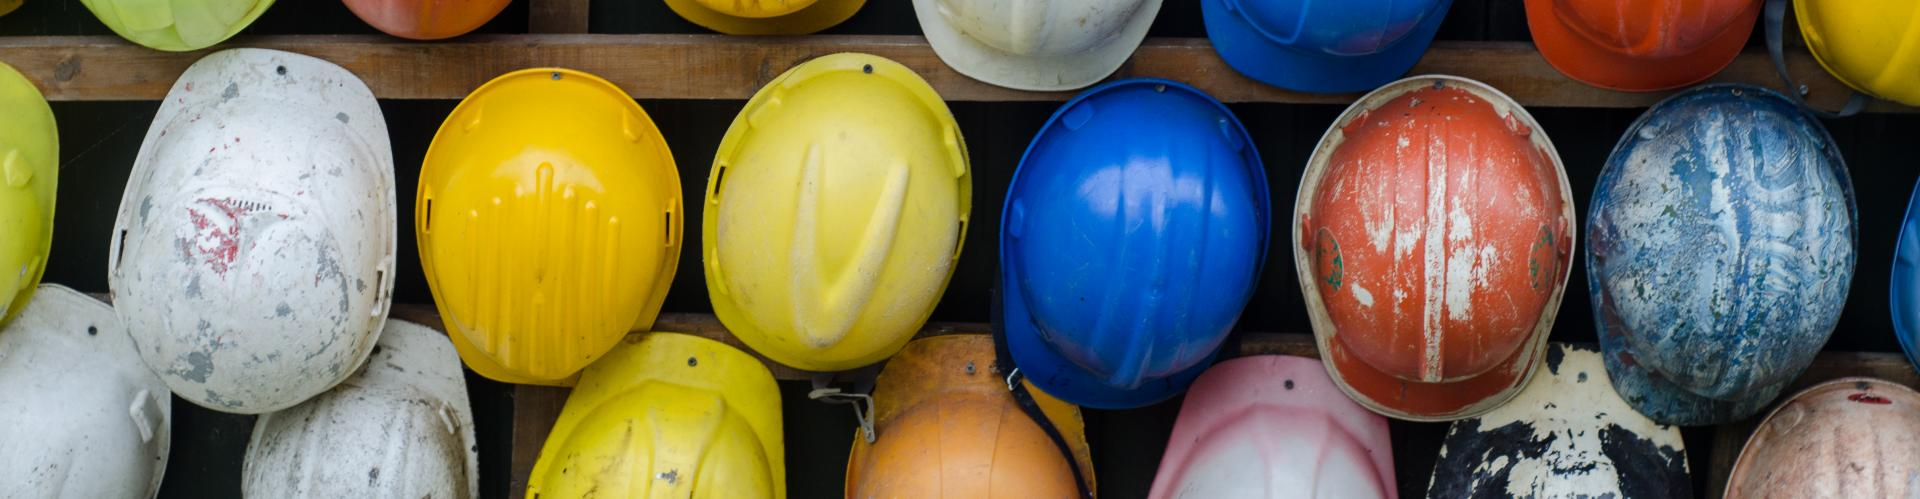 Construction codes